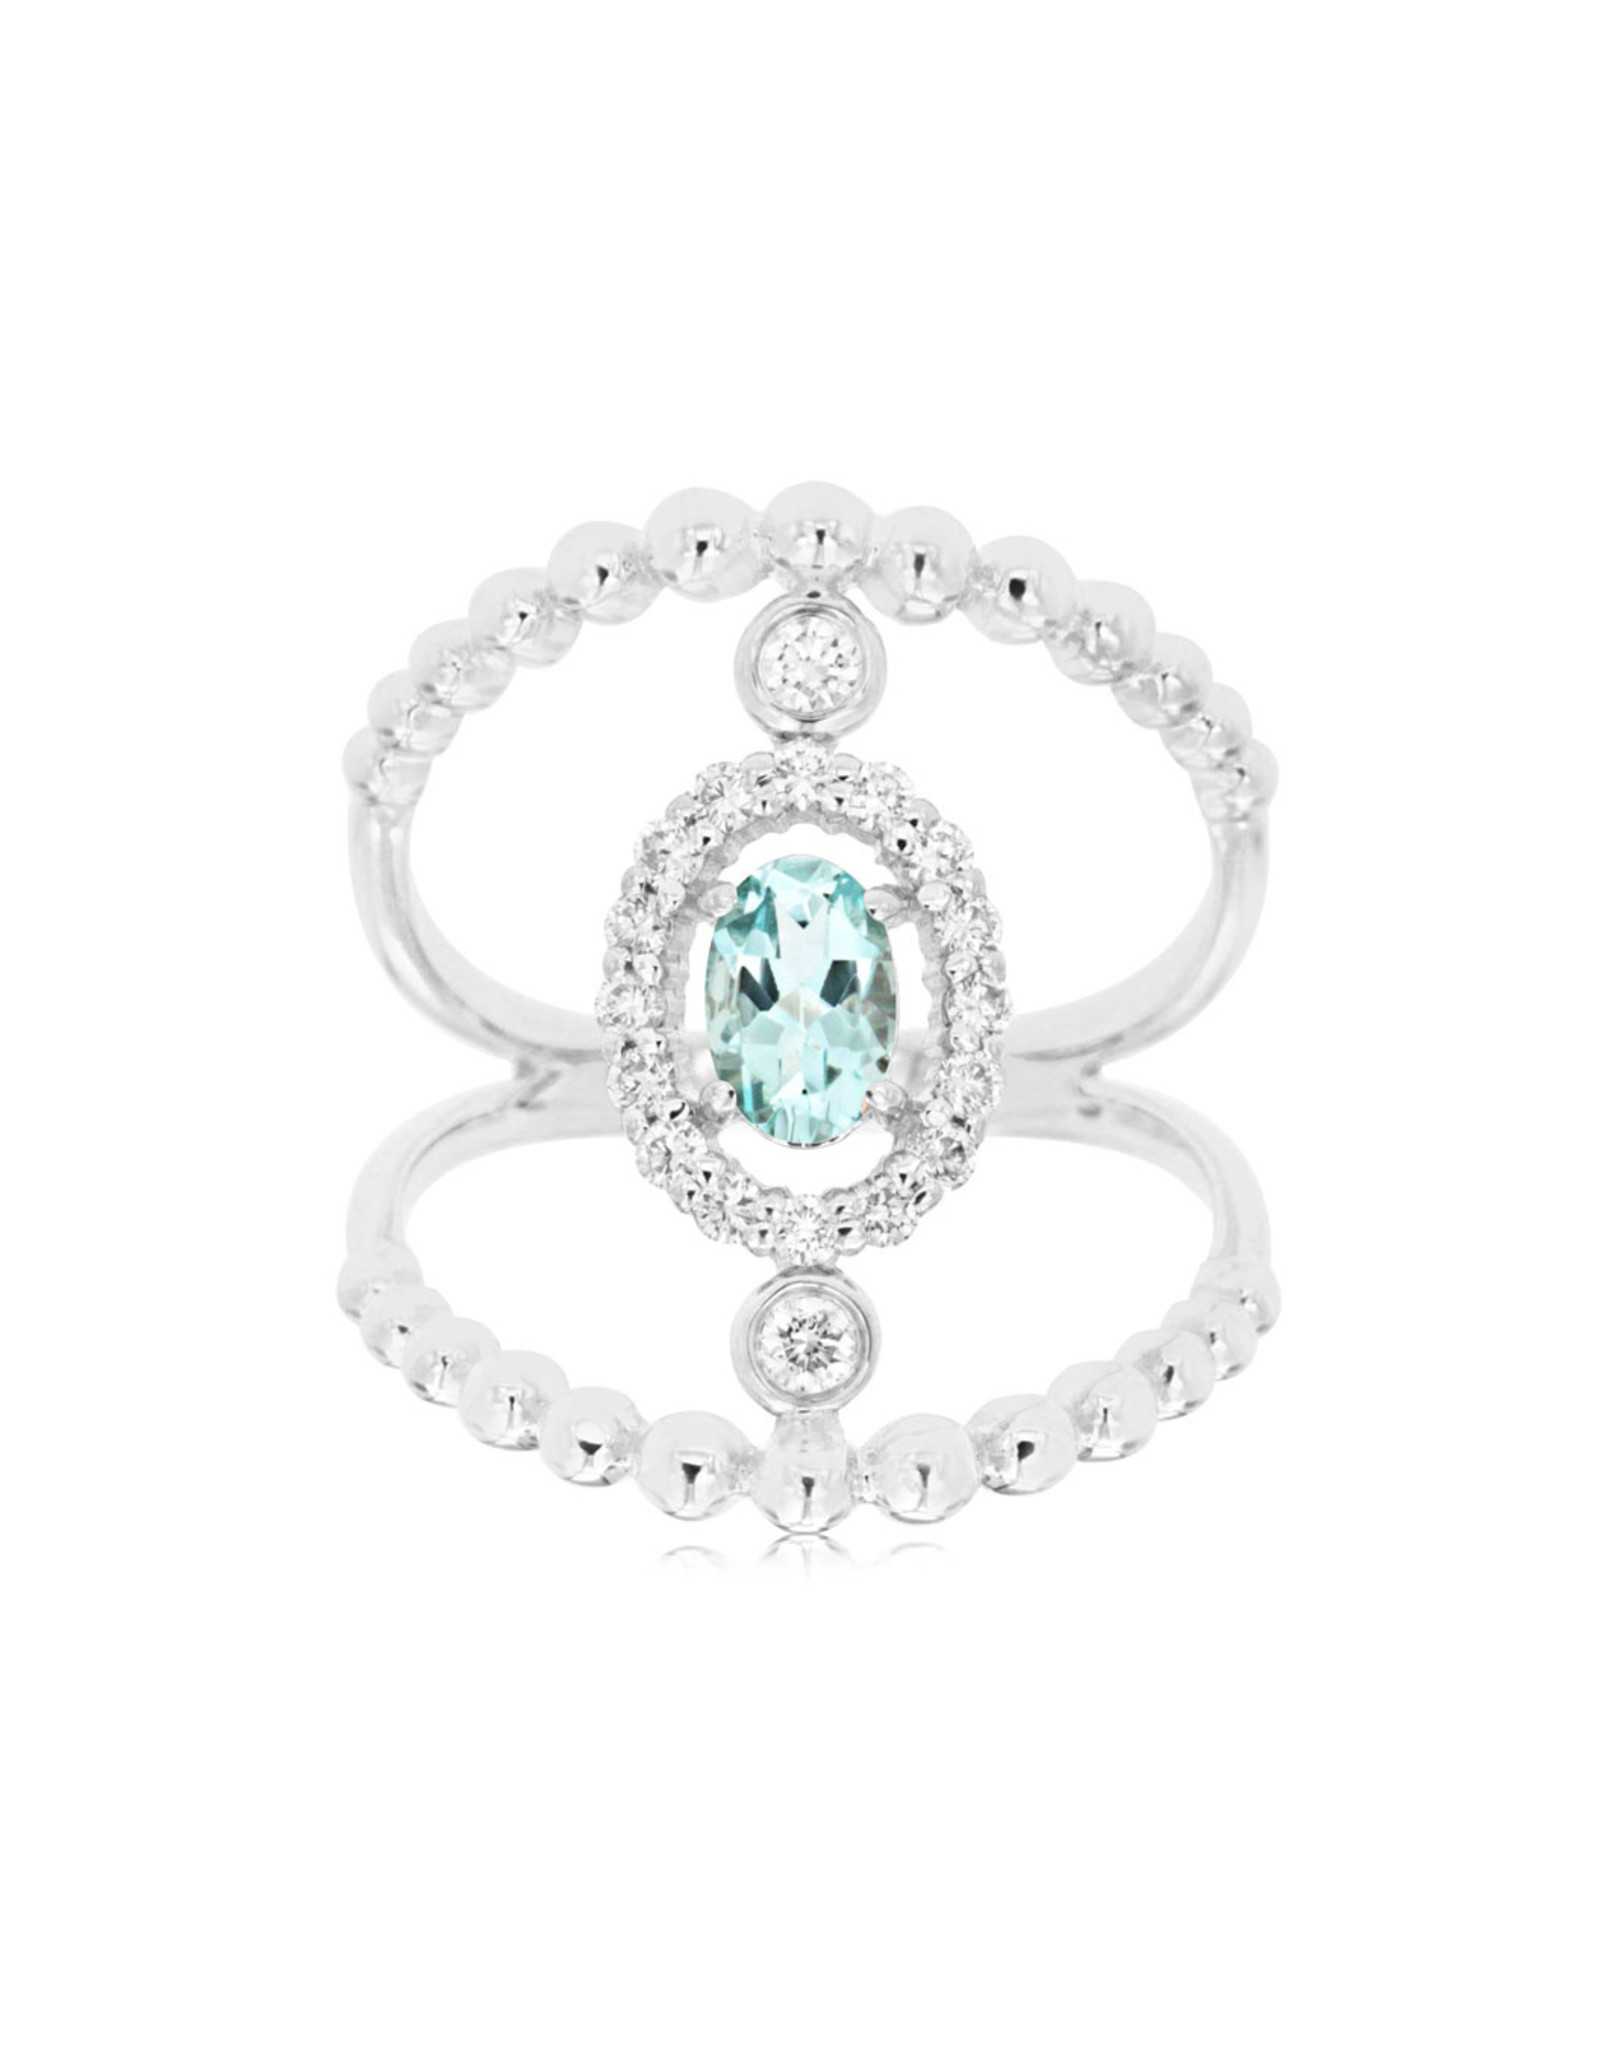 14K White Gold Oval Aquamarine and Diamond Ring, AQ: 0.45ct, D: 0.31ct